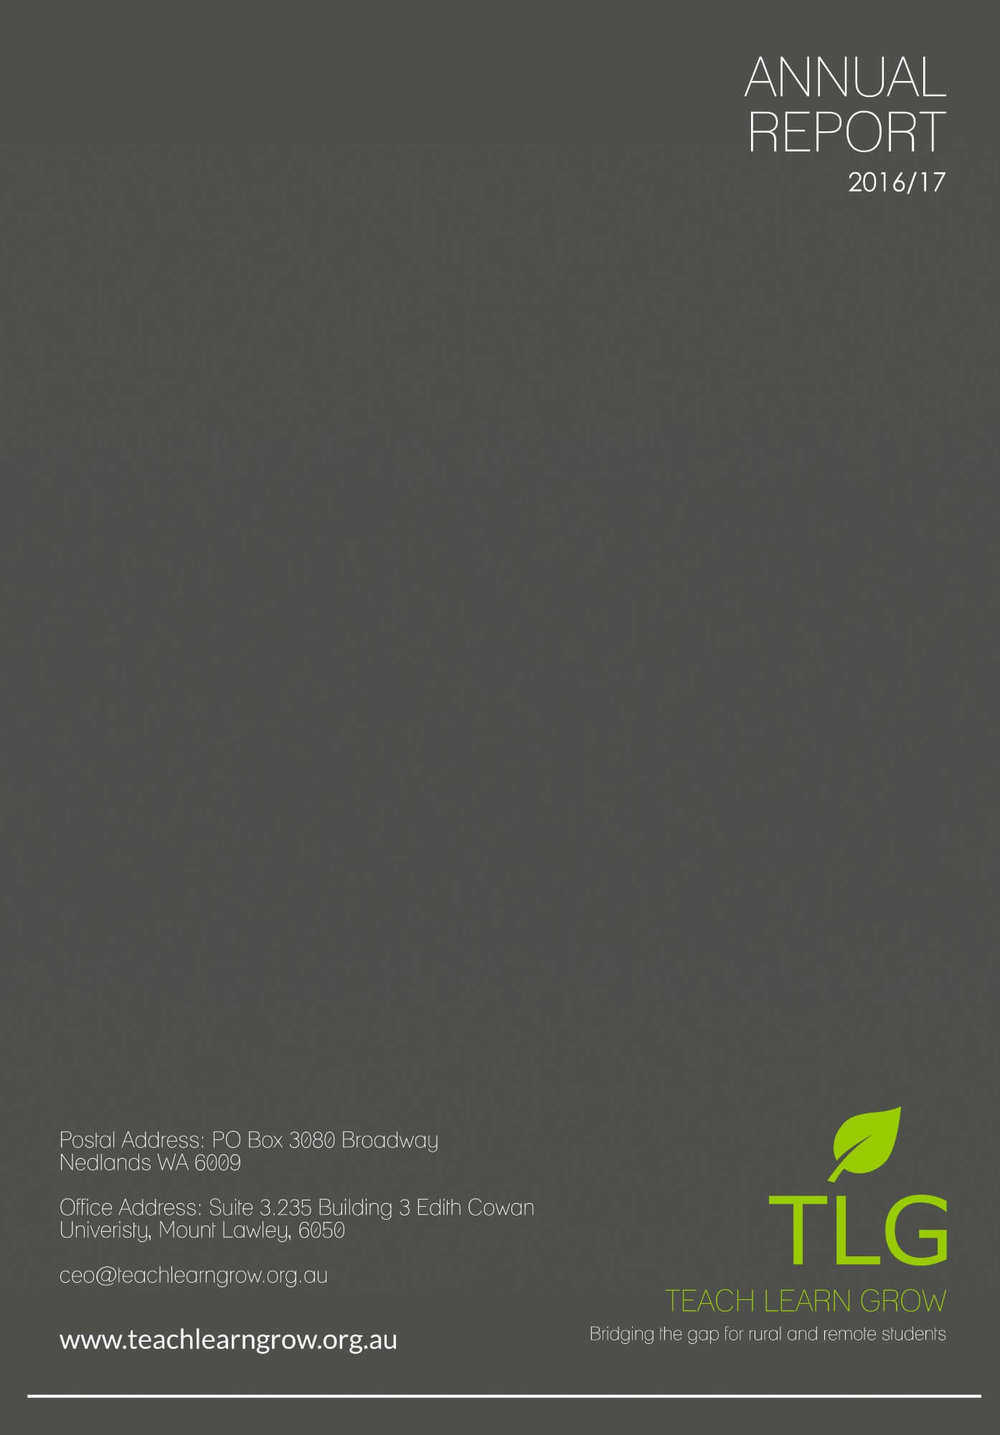 tlg-annual-report-FY16-21.jpg